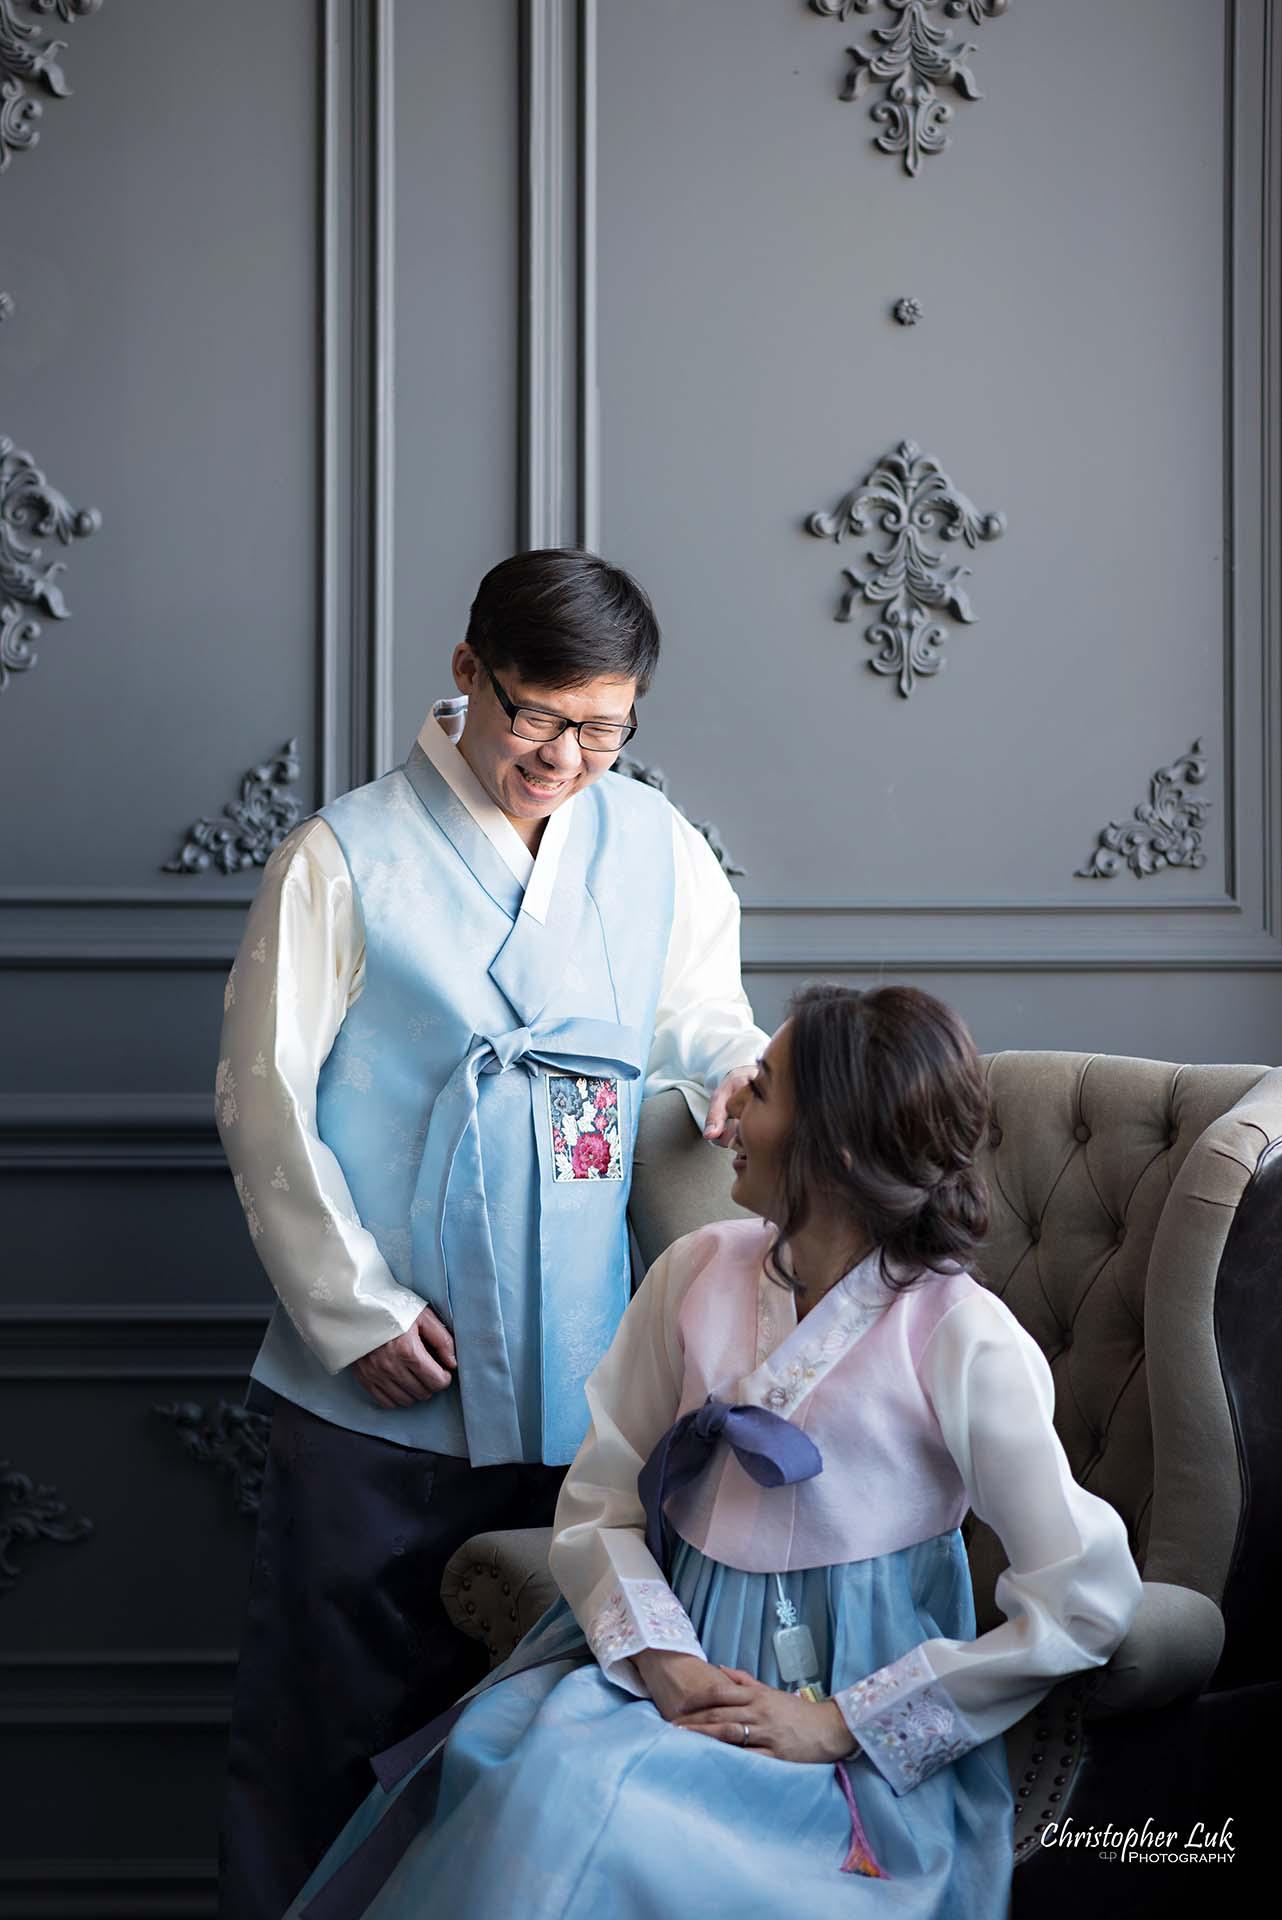 Christopher Luk Toronto Wedding Photographer - Mint Room Studios Bride Groom Natural Candid Photojournalistic Library Studio Korean Drama Hanbok Leather Wingback Chair